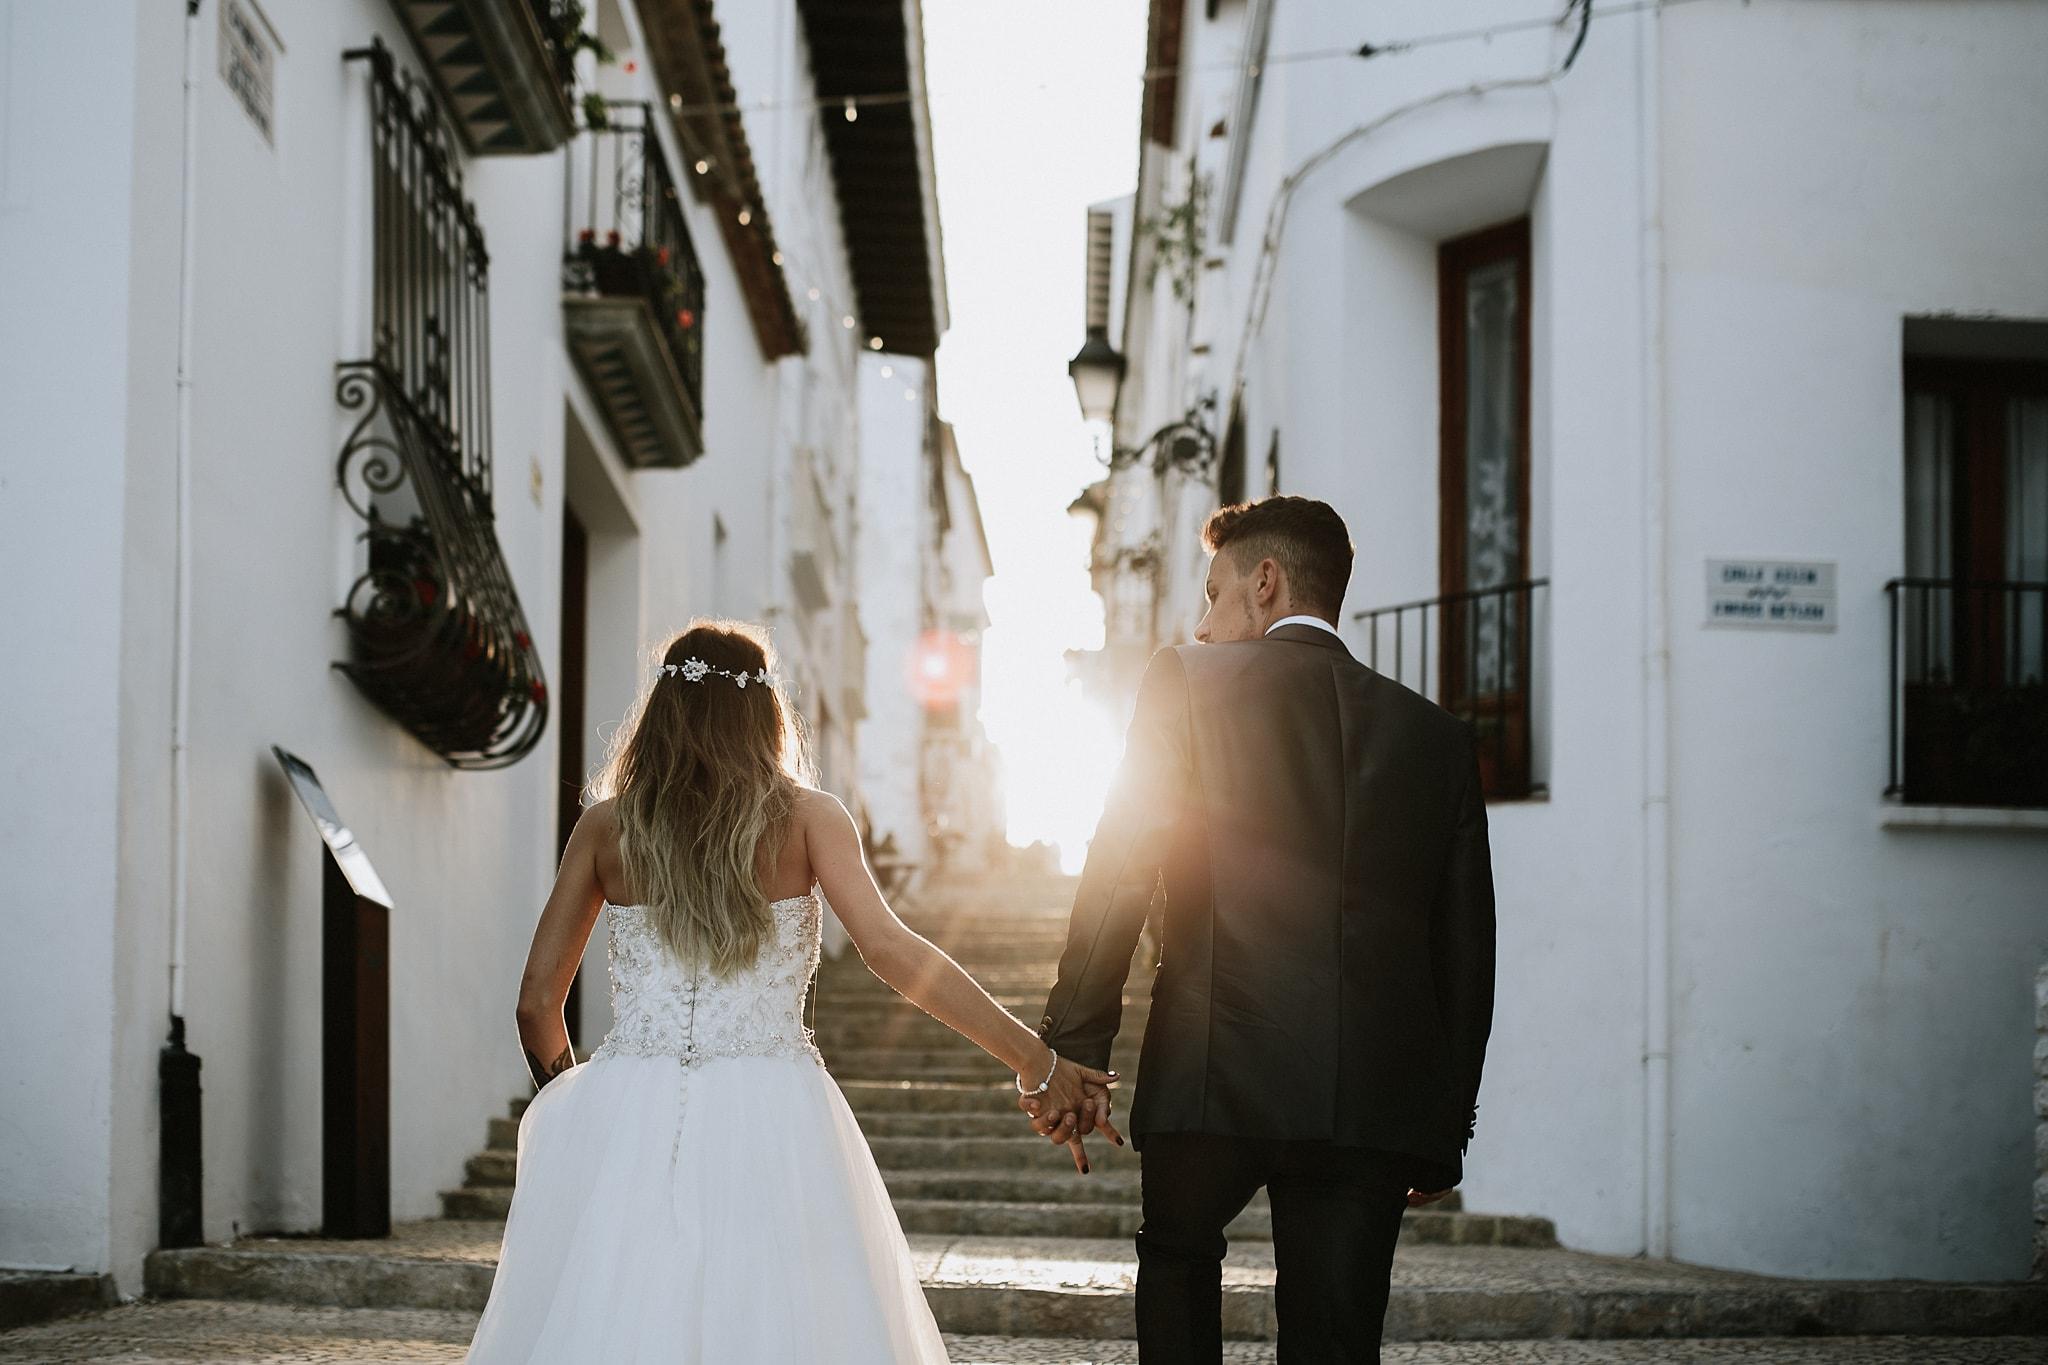 prisma-blanco-altea-wedding-photographer-27